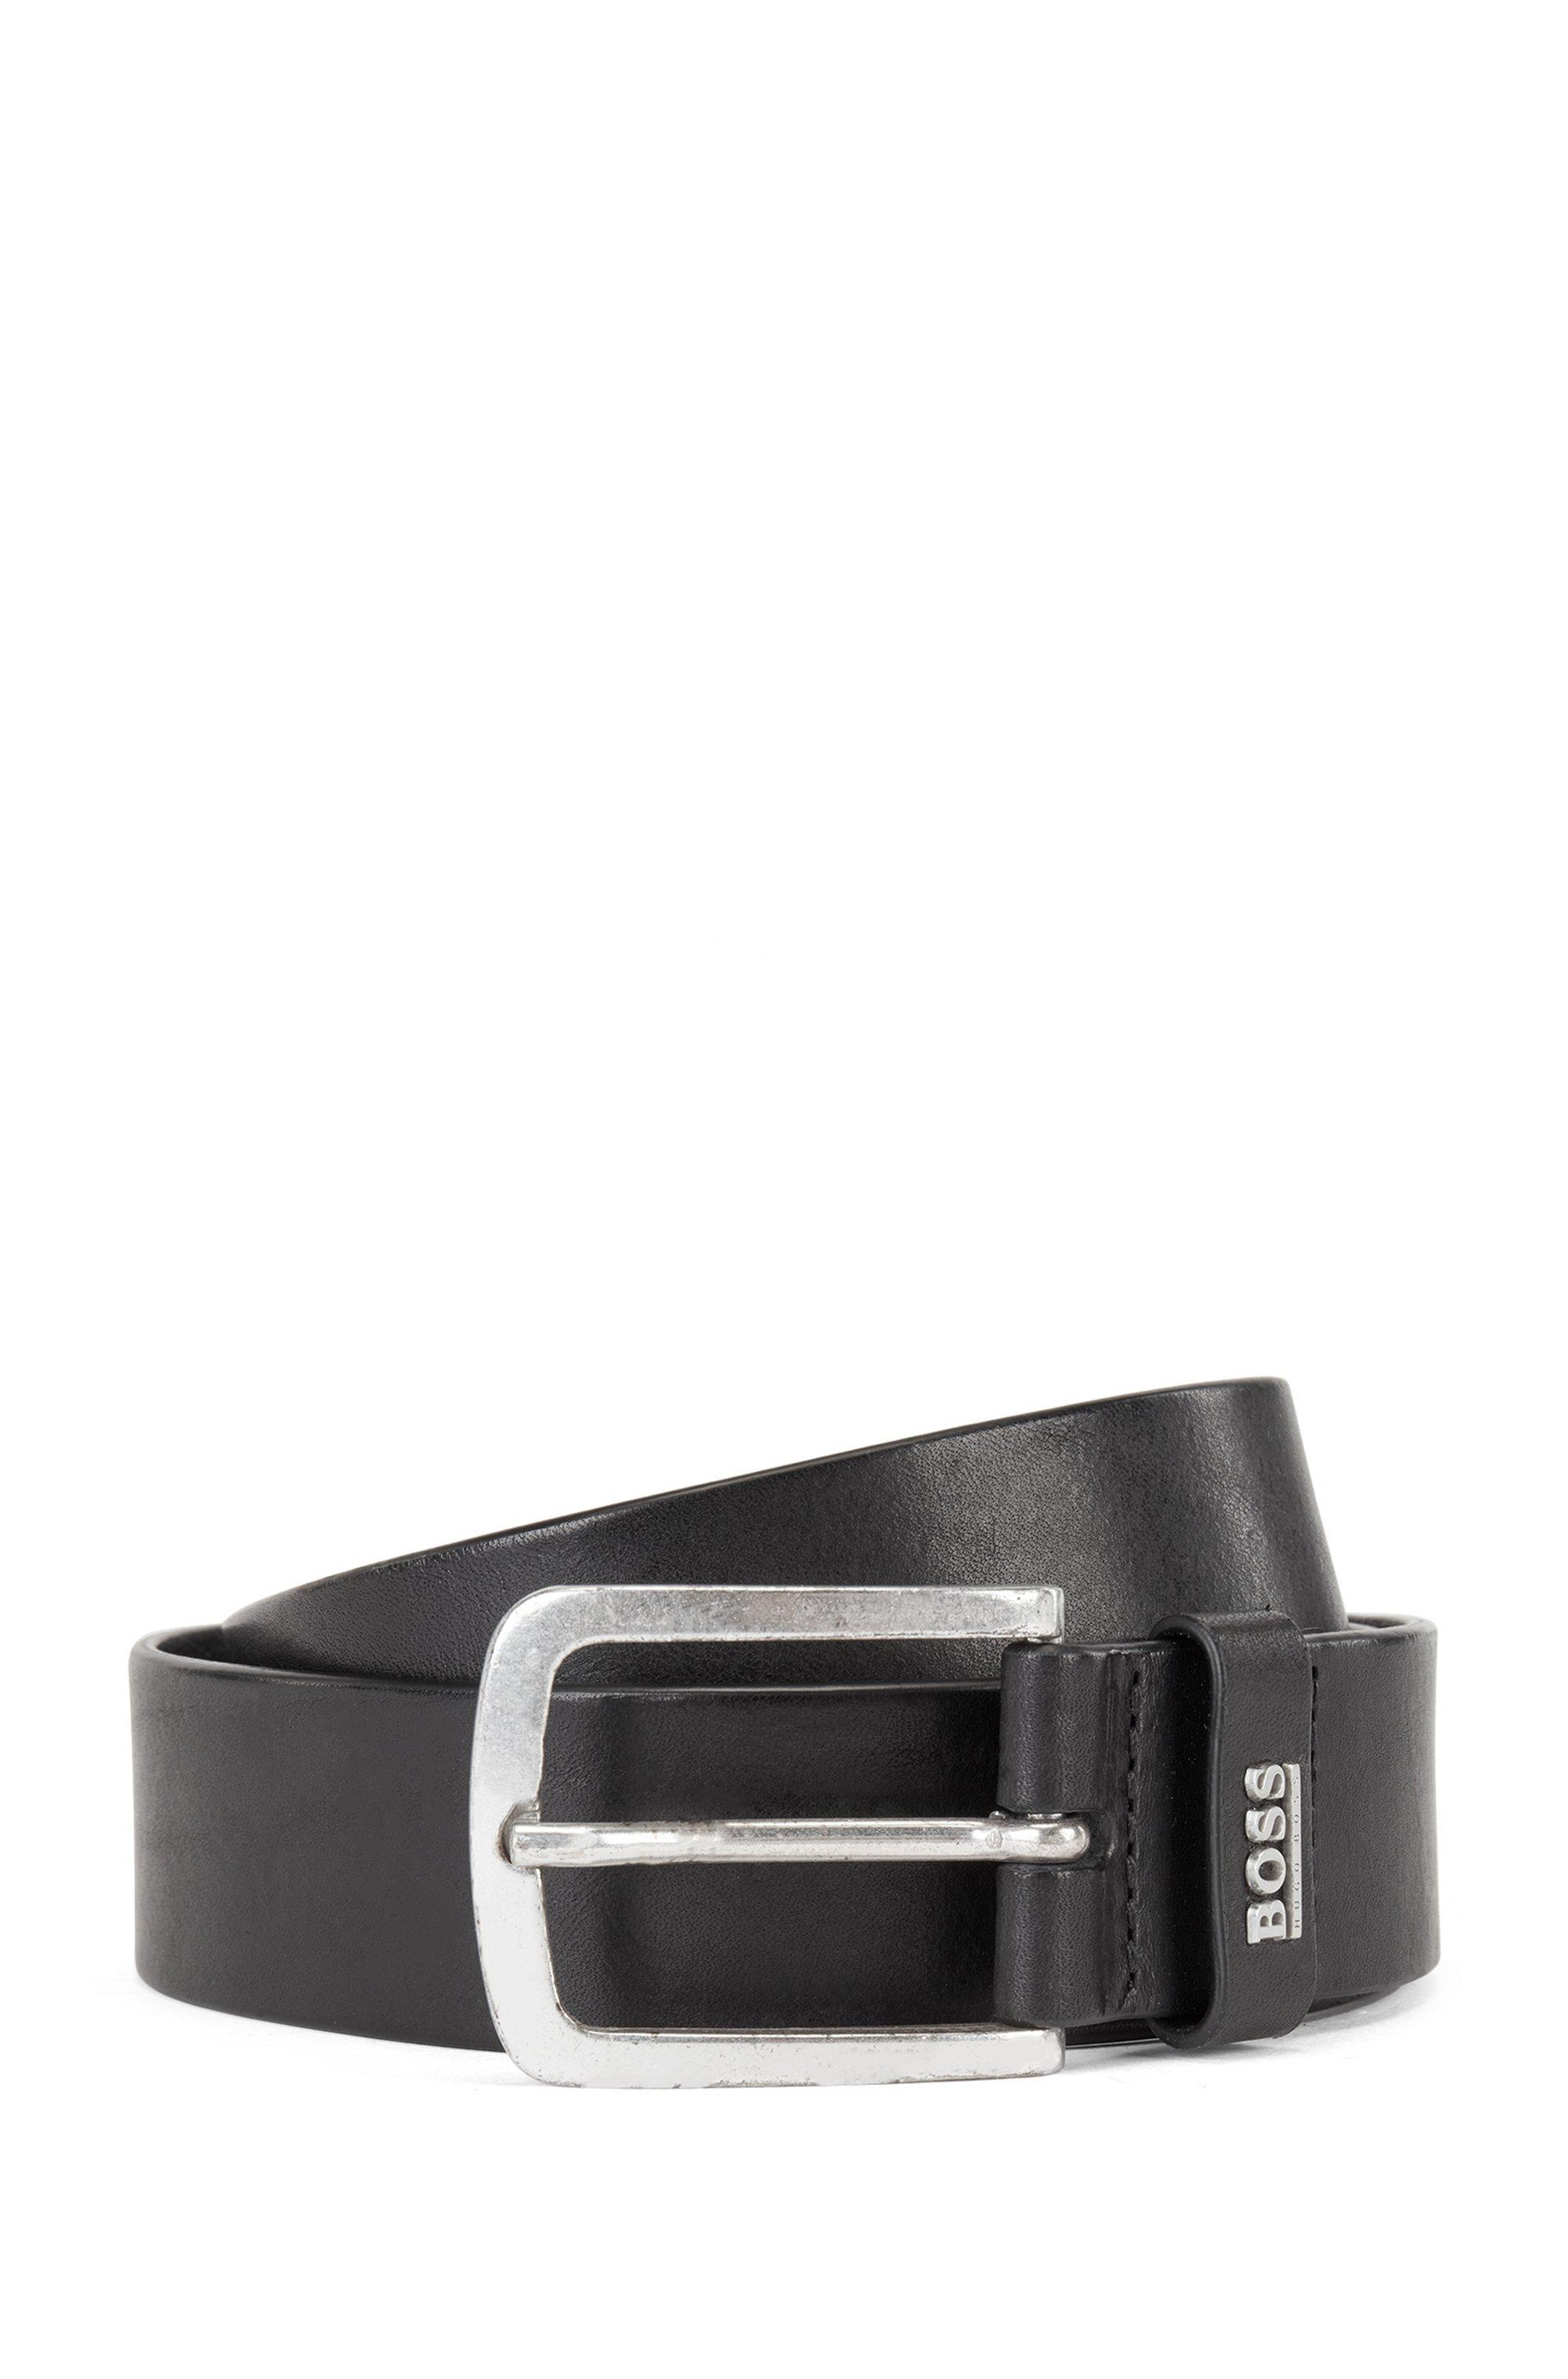 Italian-leather belt with logo keeper, Black